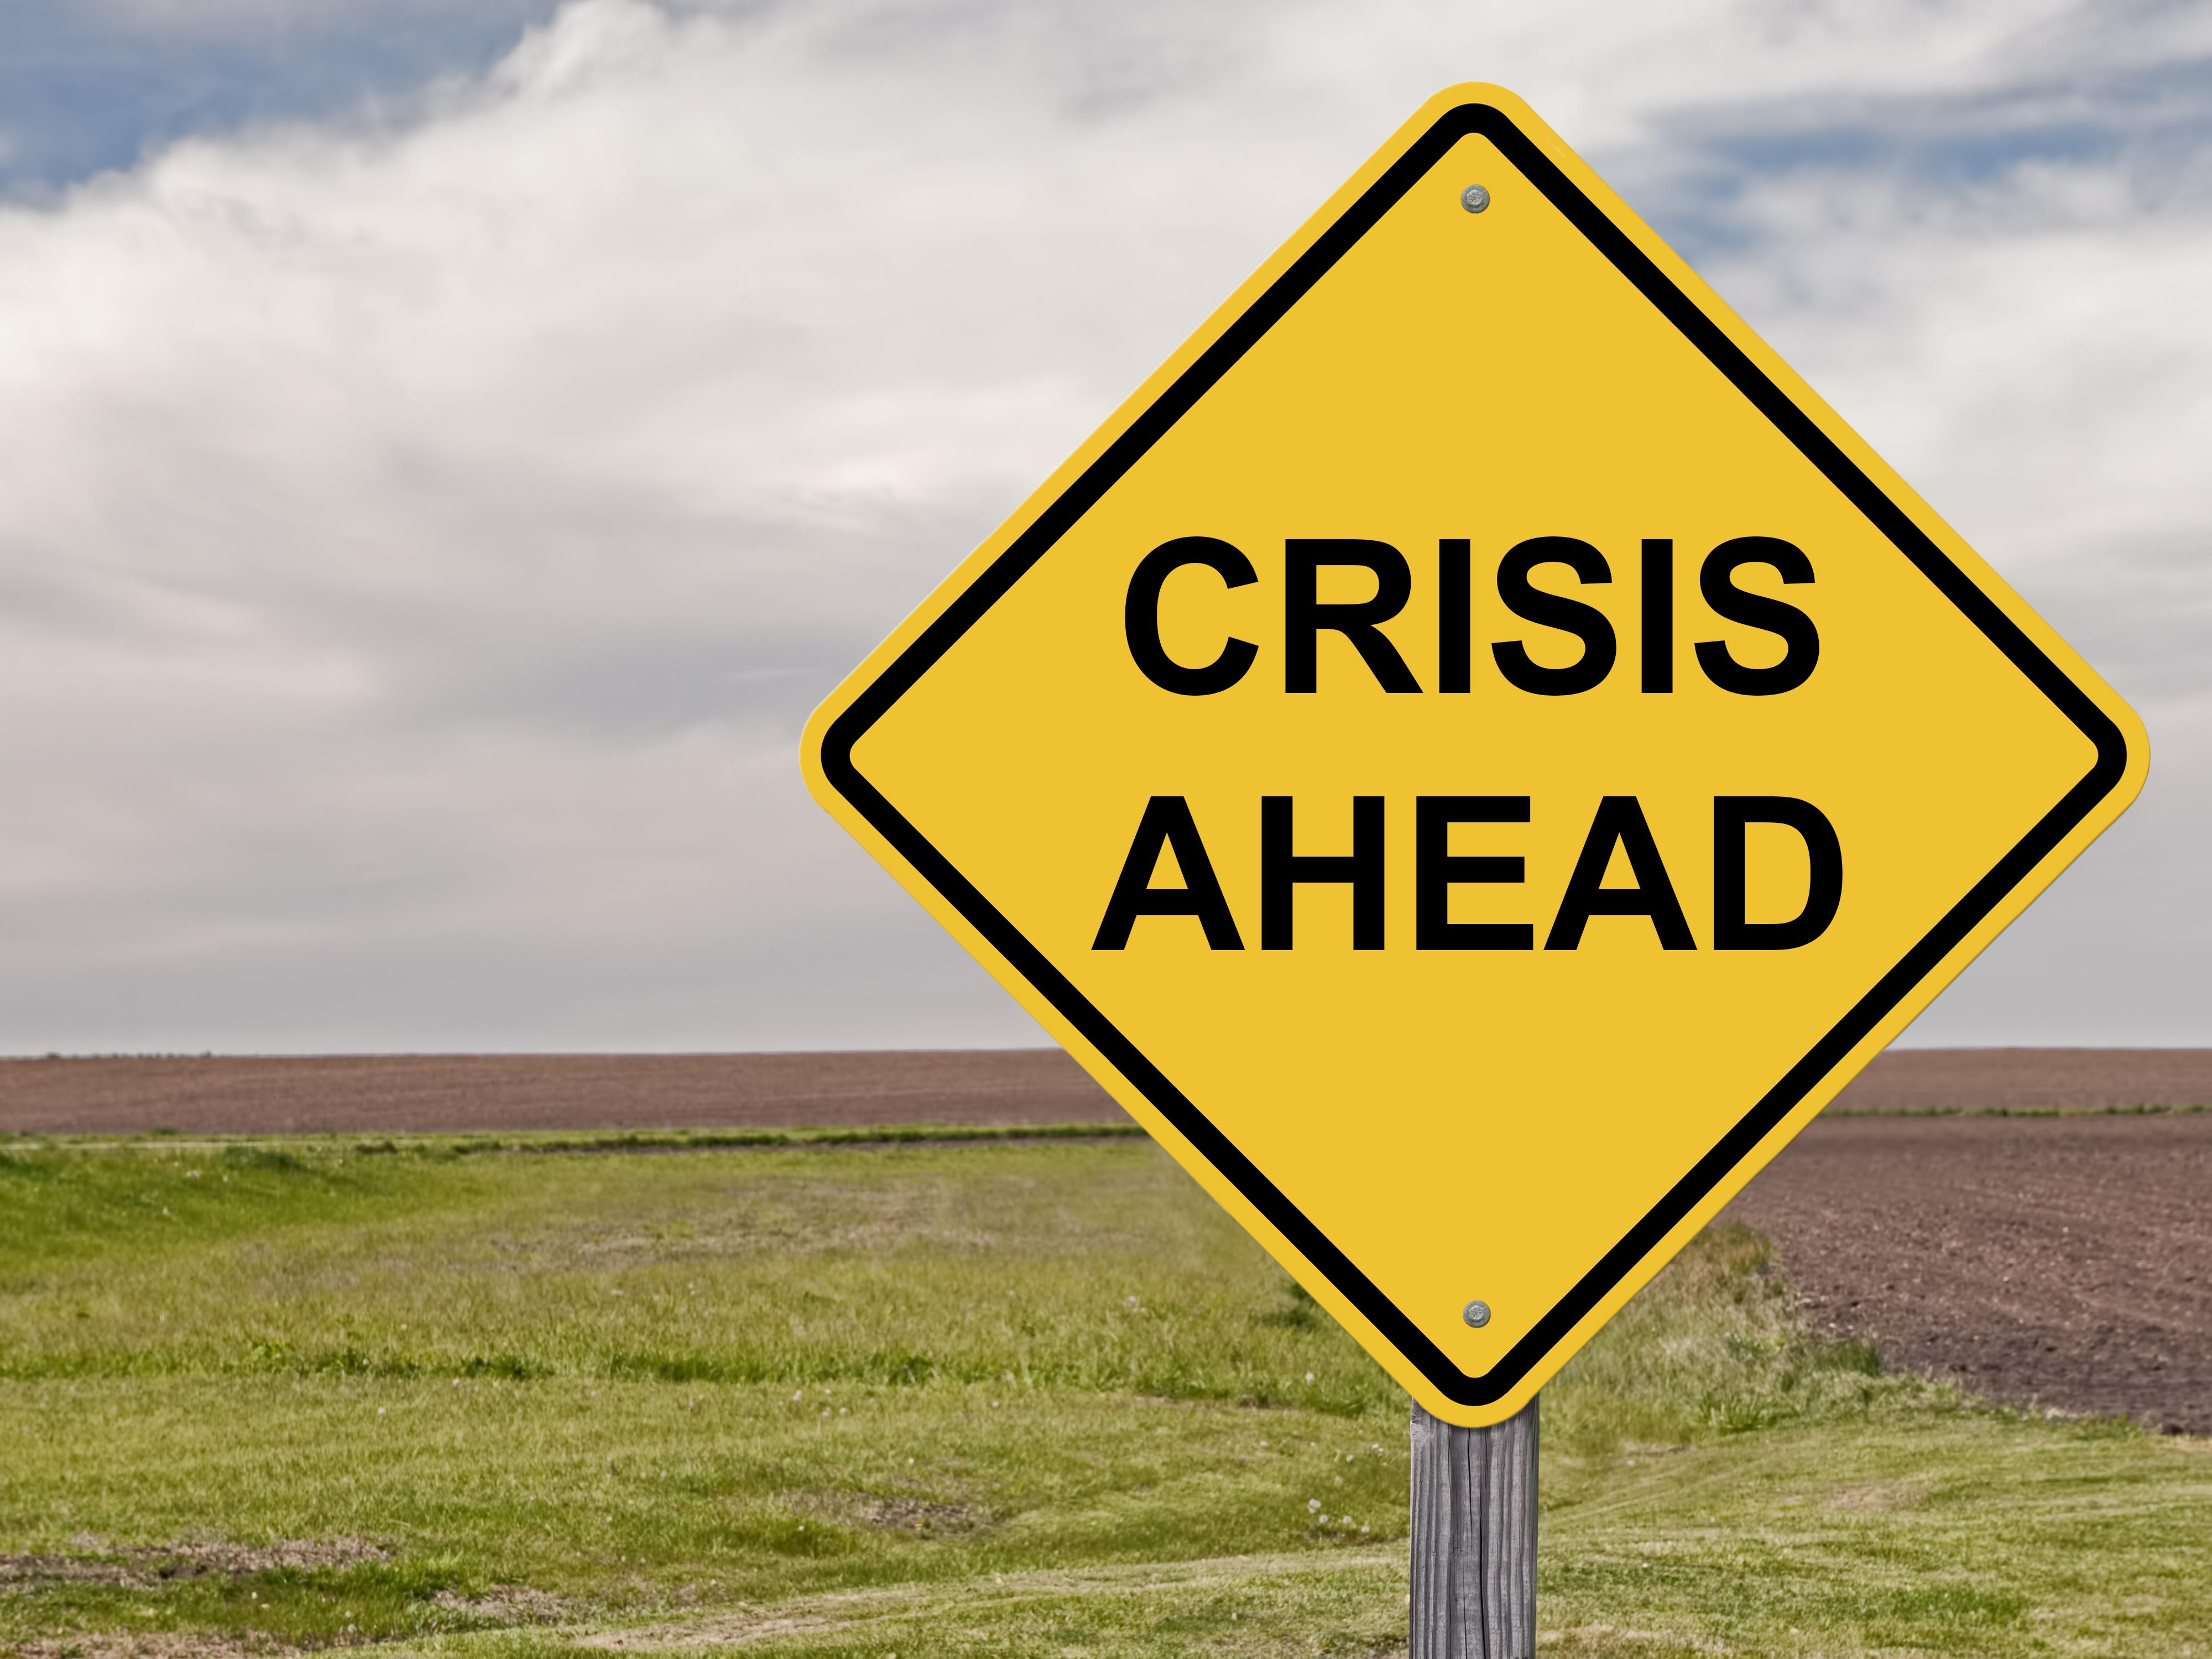 https://assets.sourcemedia.com/b2/b8/ad4a84324fa79afb0180694ad5a3/crisis-ahead.jpeg